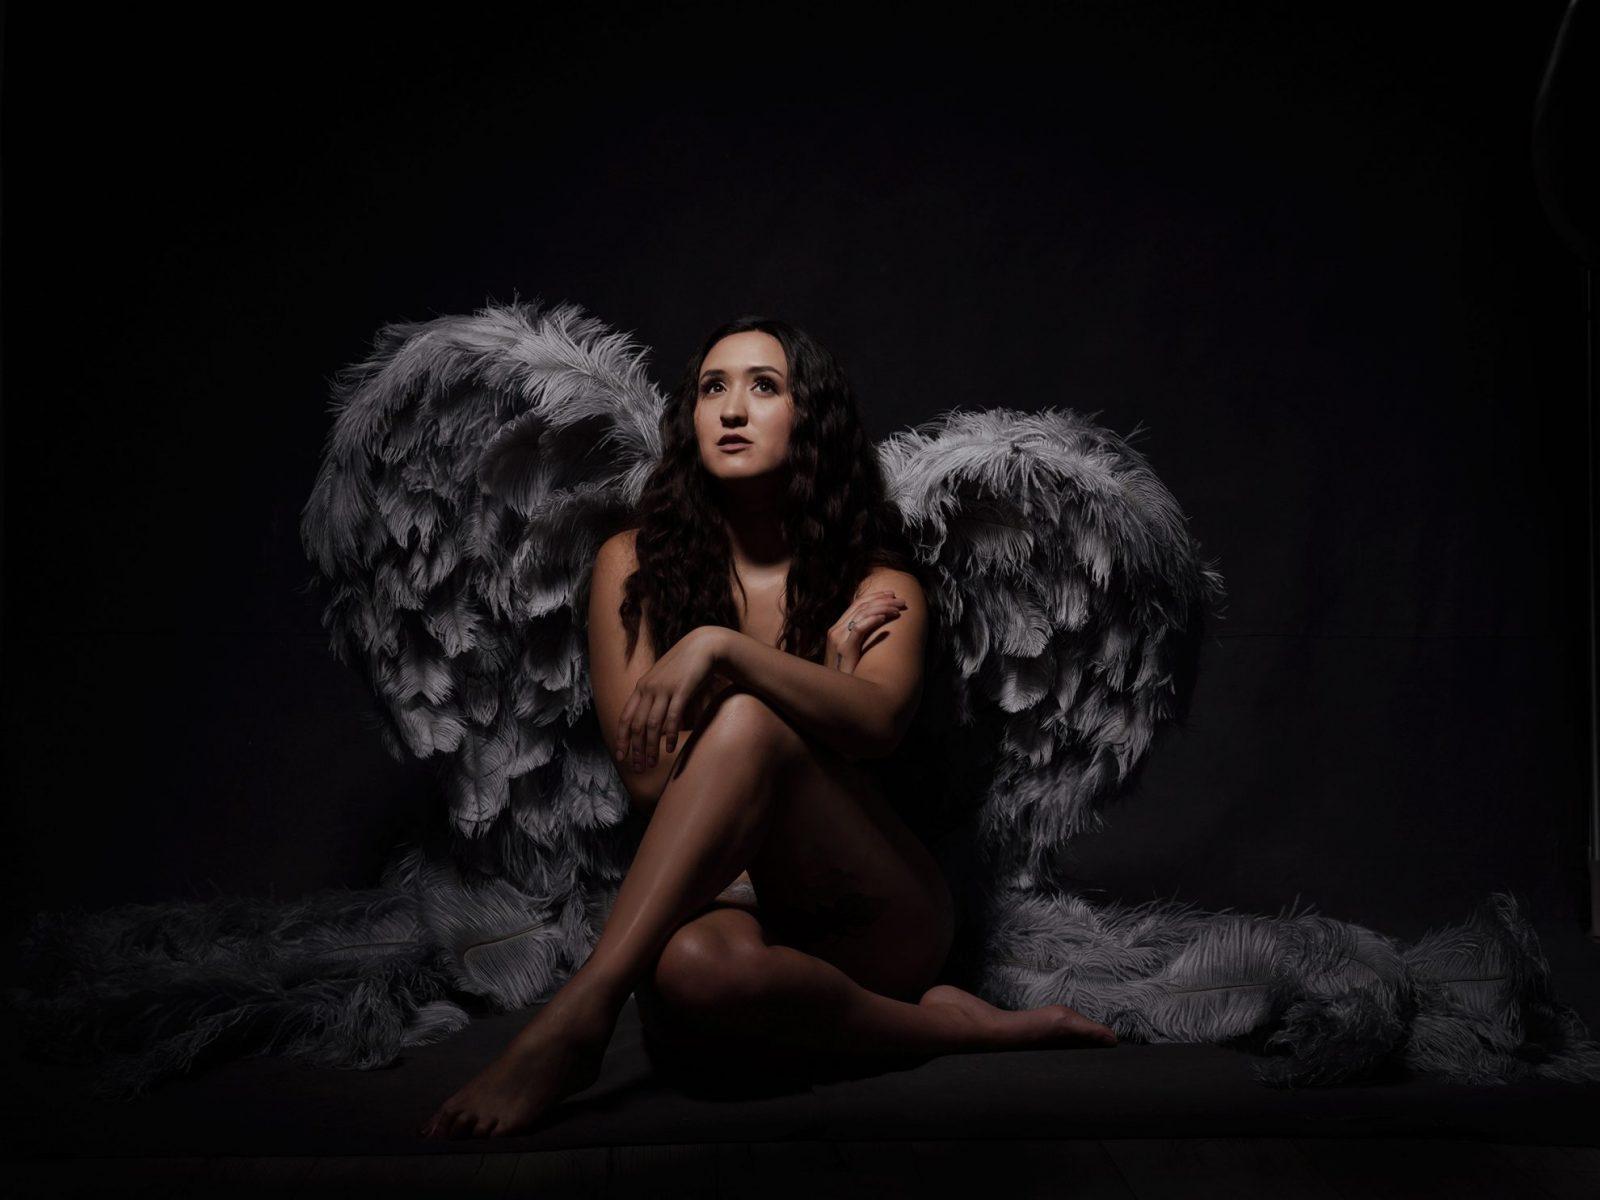 Eternal Angel portrait session by Johanna Elizabeth